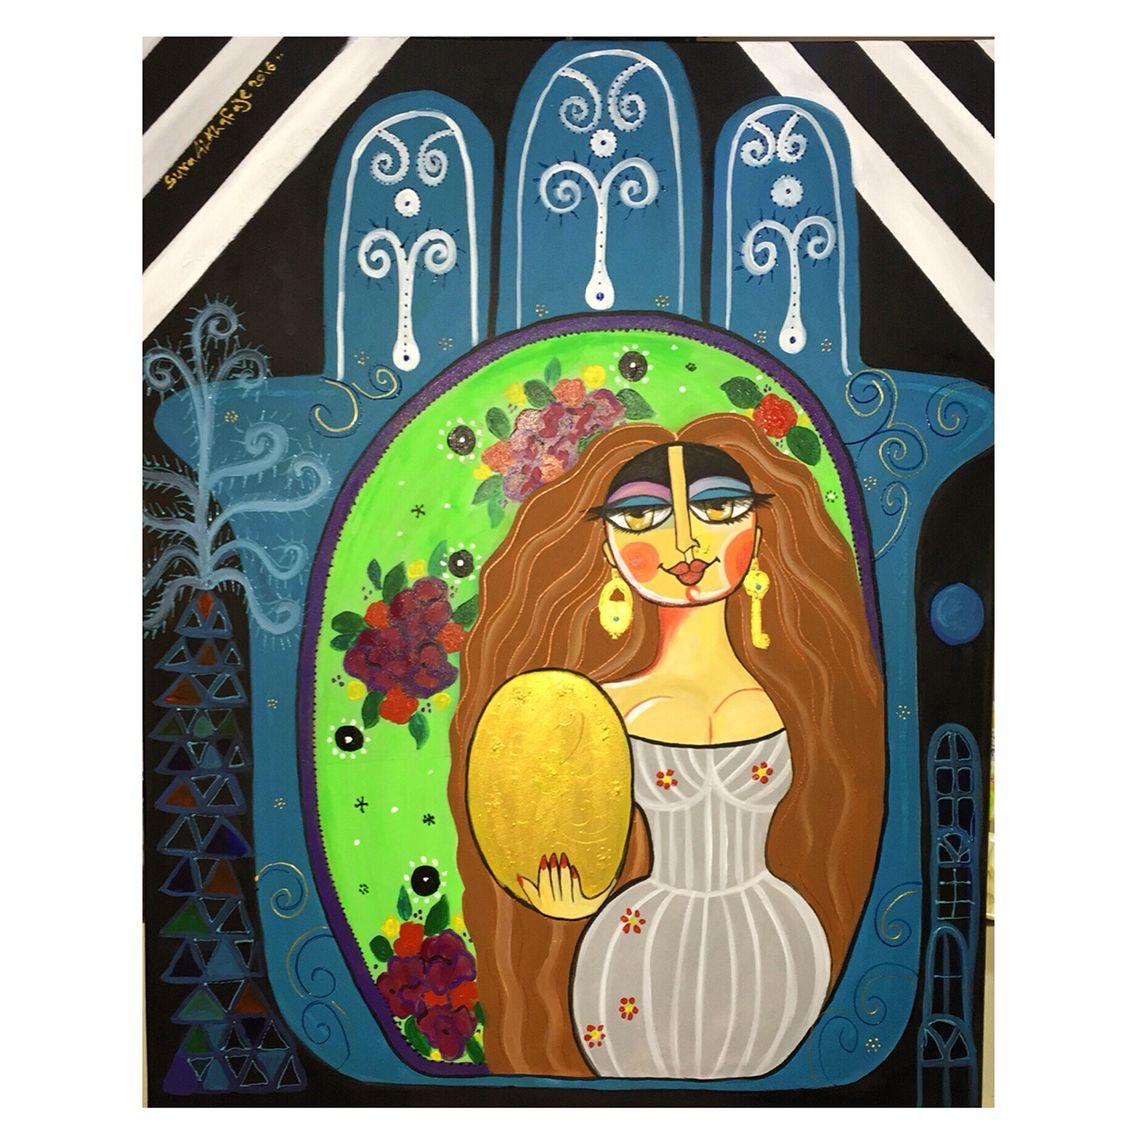 عروس الجنوب Braide Of South Acrylic On Canvas Size 100 80cm سرى الخفاجي كف حسد مراة جنوب Art Artist Painting P Art Painting Acrylic Painting